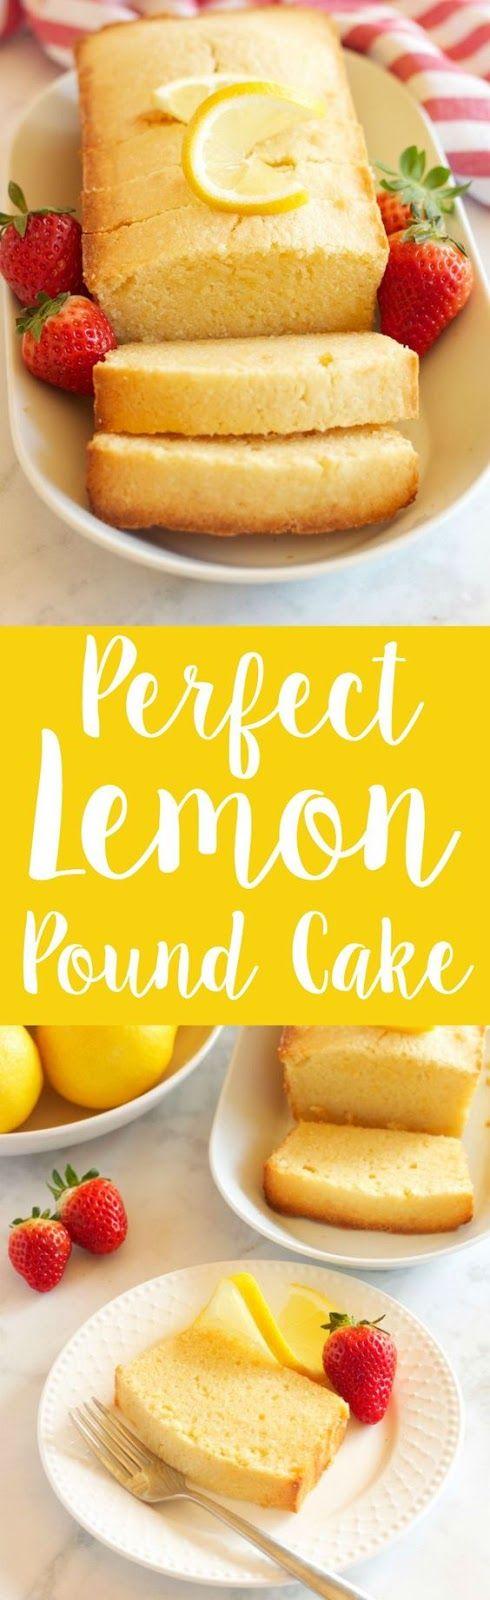 Perfect Lemon Pound Cake | Cake And Food Recipe